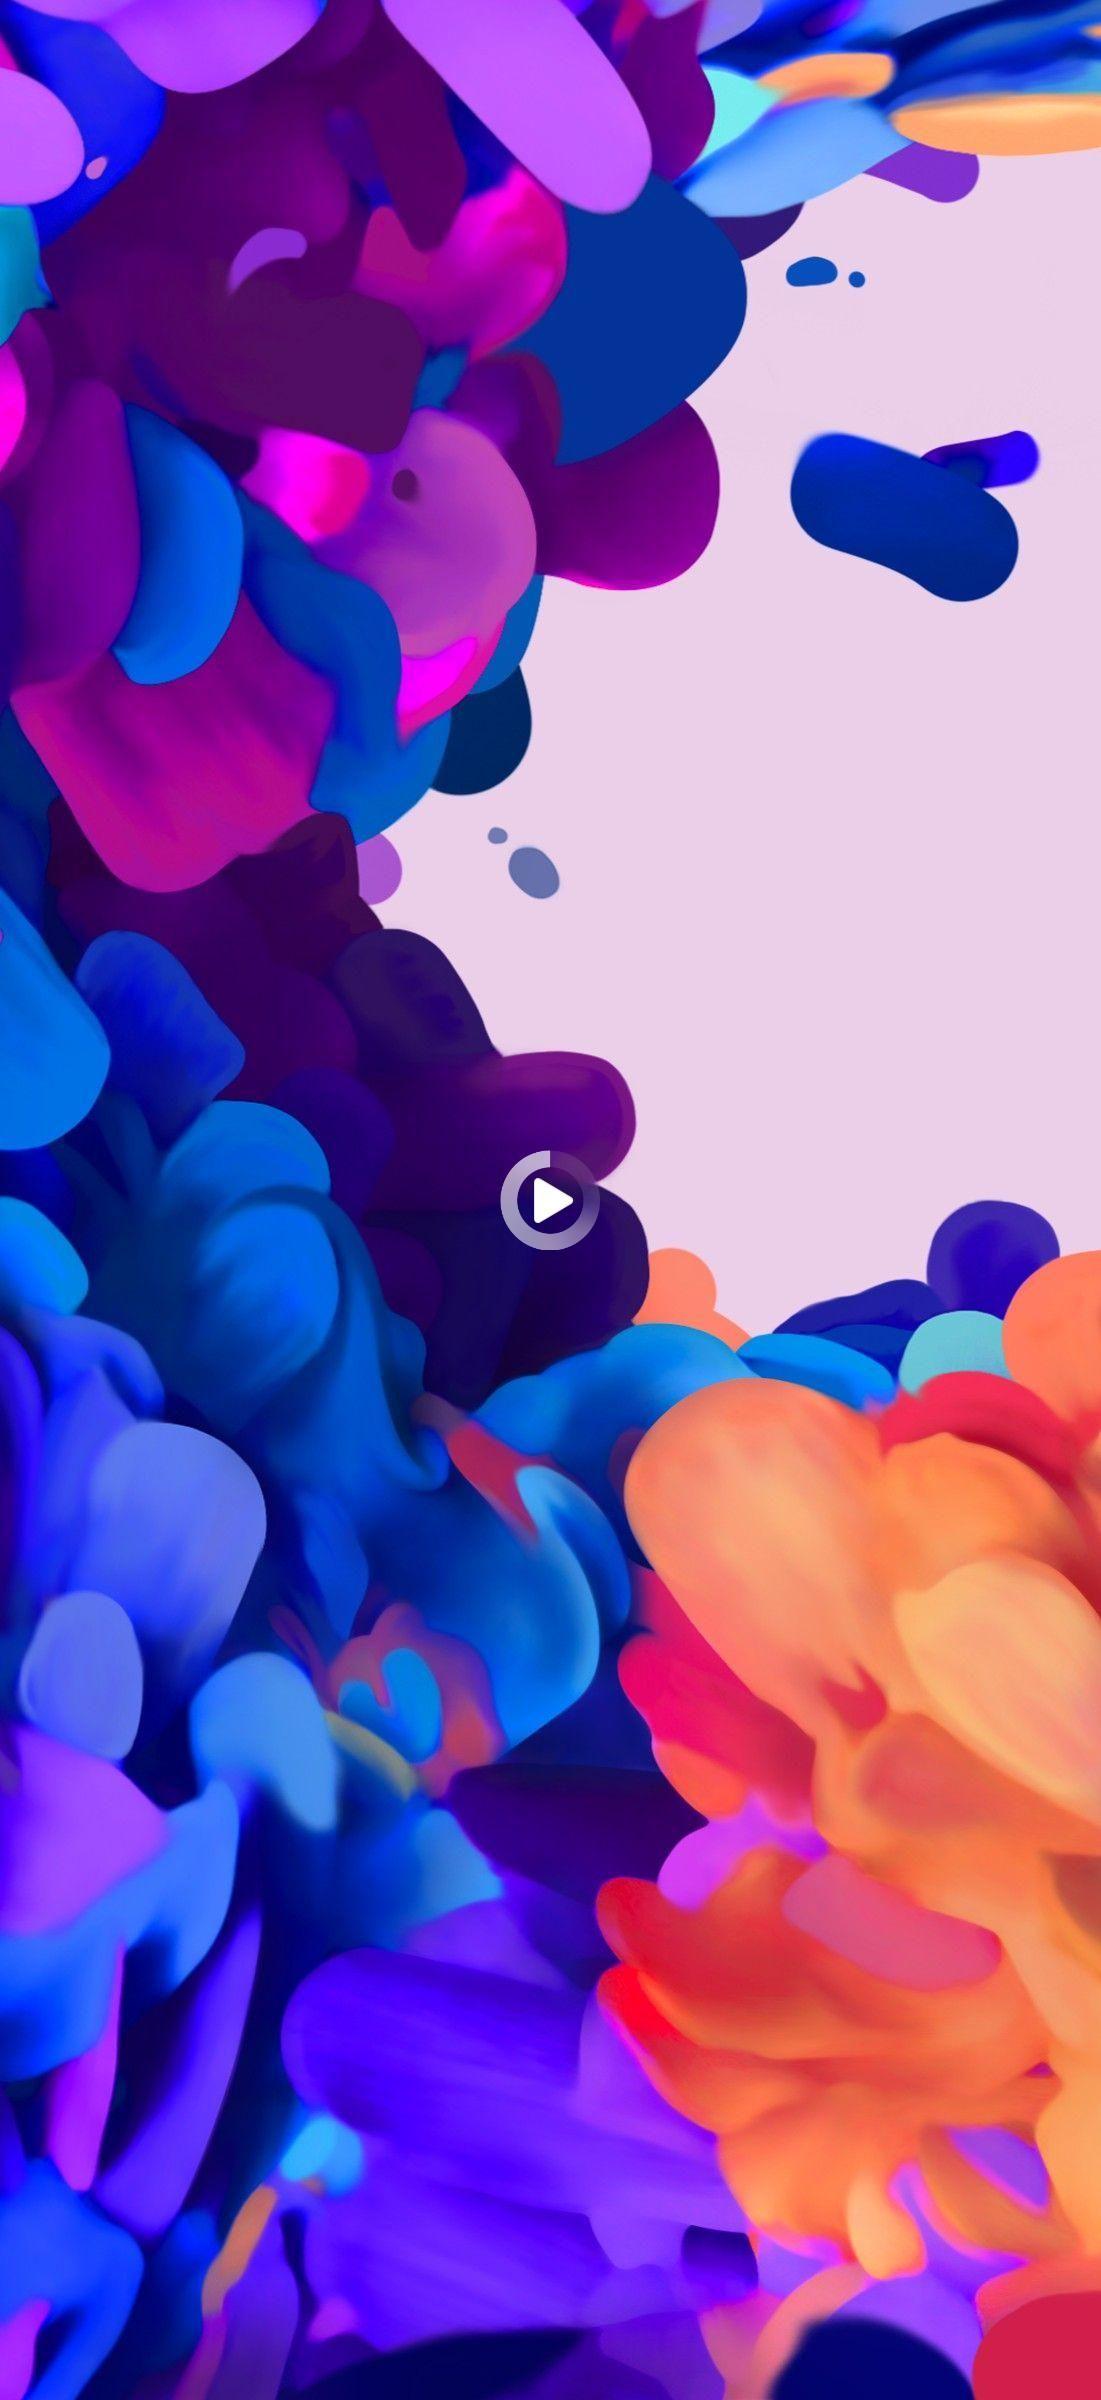 Organic Balloon Garland From Paper Bloom Twist New Sites In 2021 Galaxy Phone Wallpaper Galaxy Wallpaper Samsung Galaxy Wallpaper